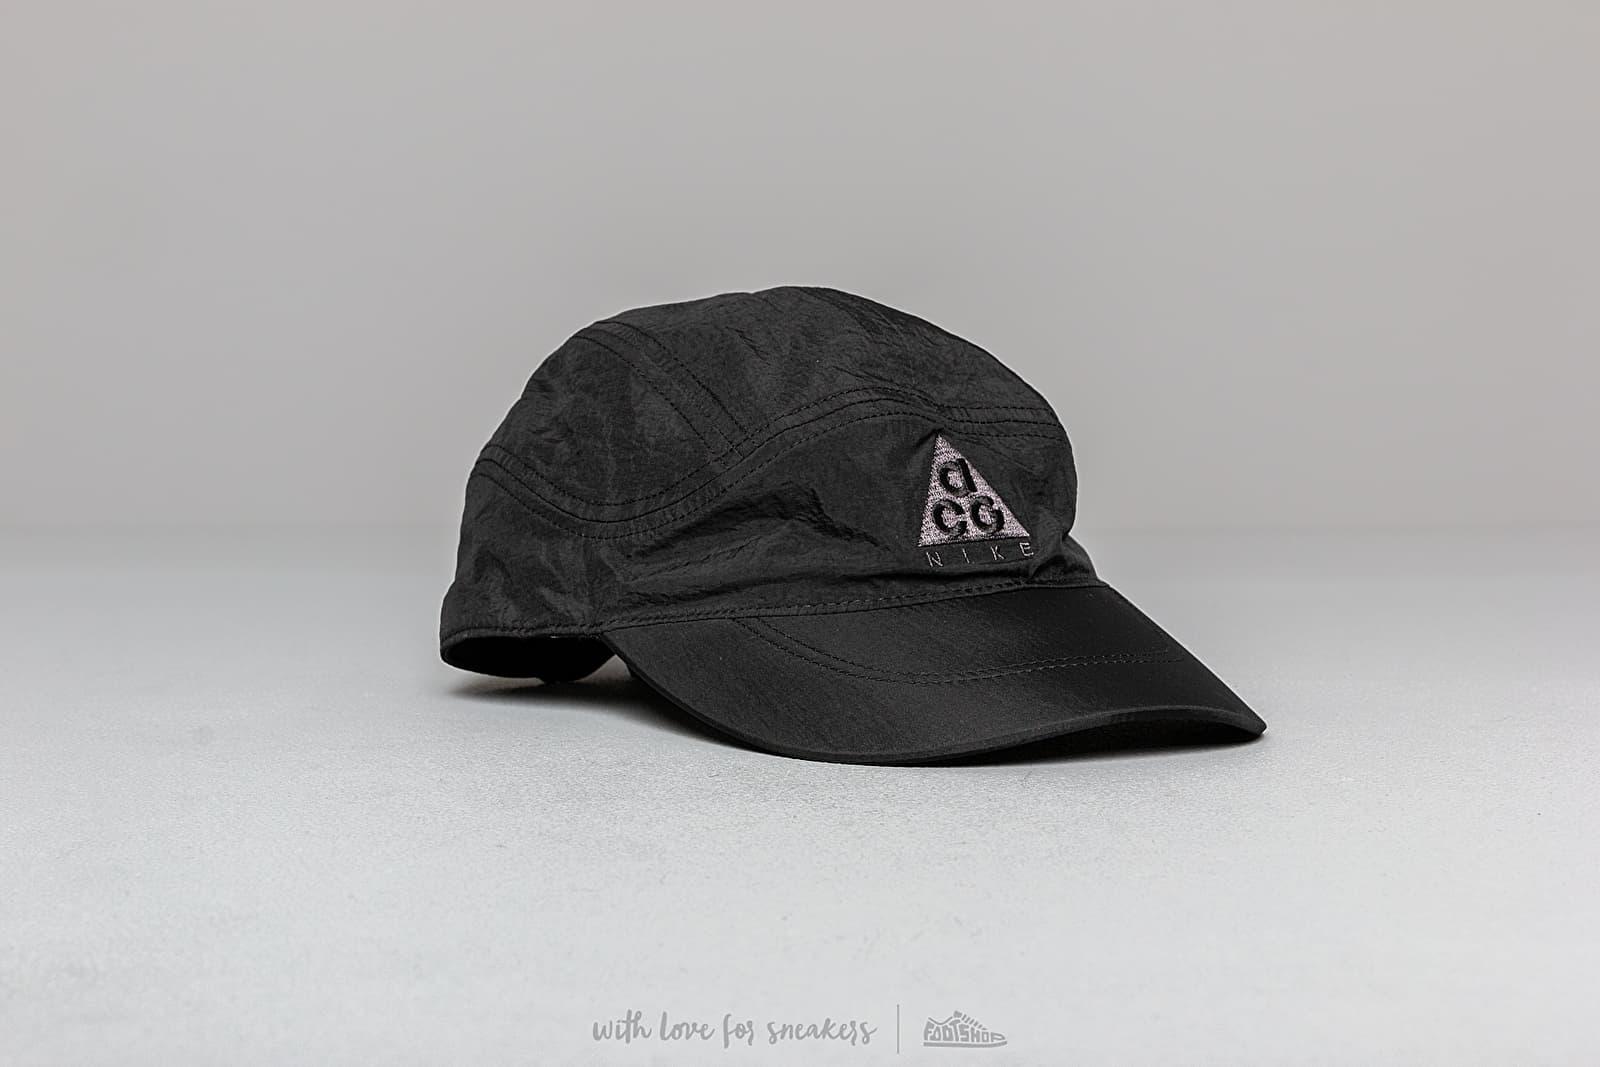 53305651 Nike NRG ACG Tailwind Cap Black/ Anthracite | Footshop